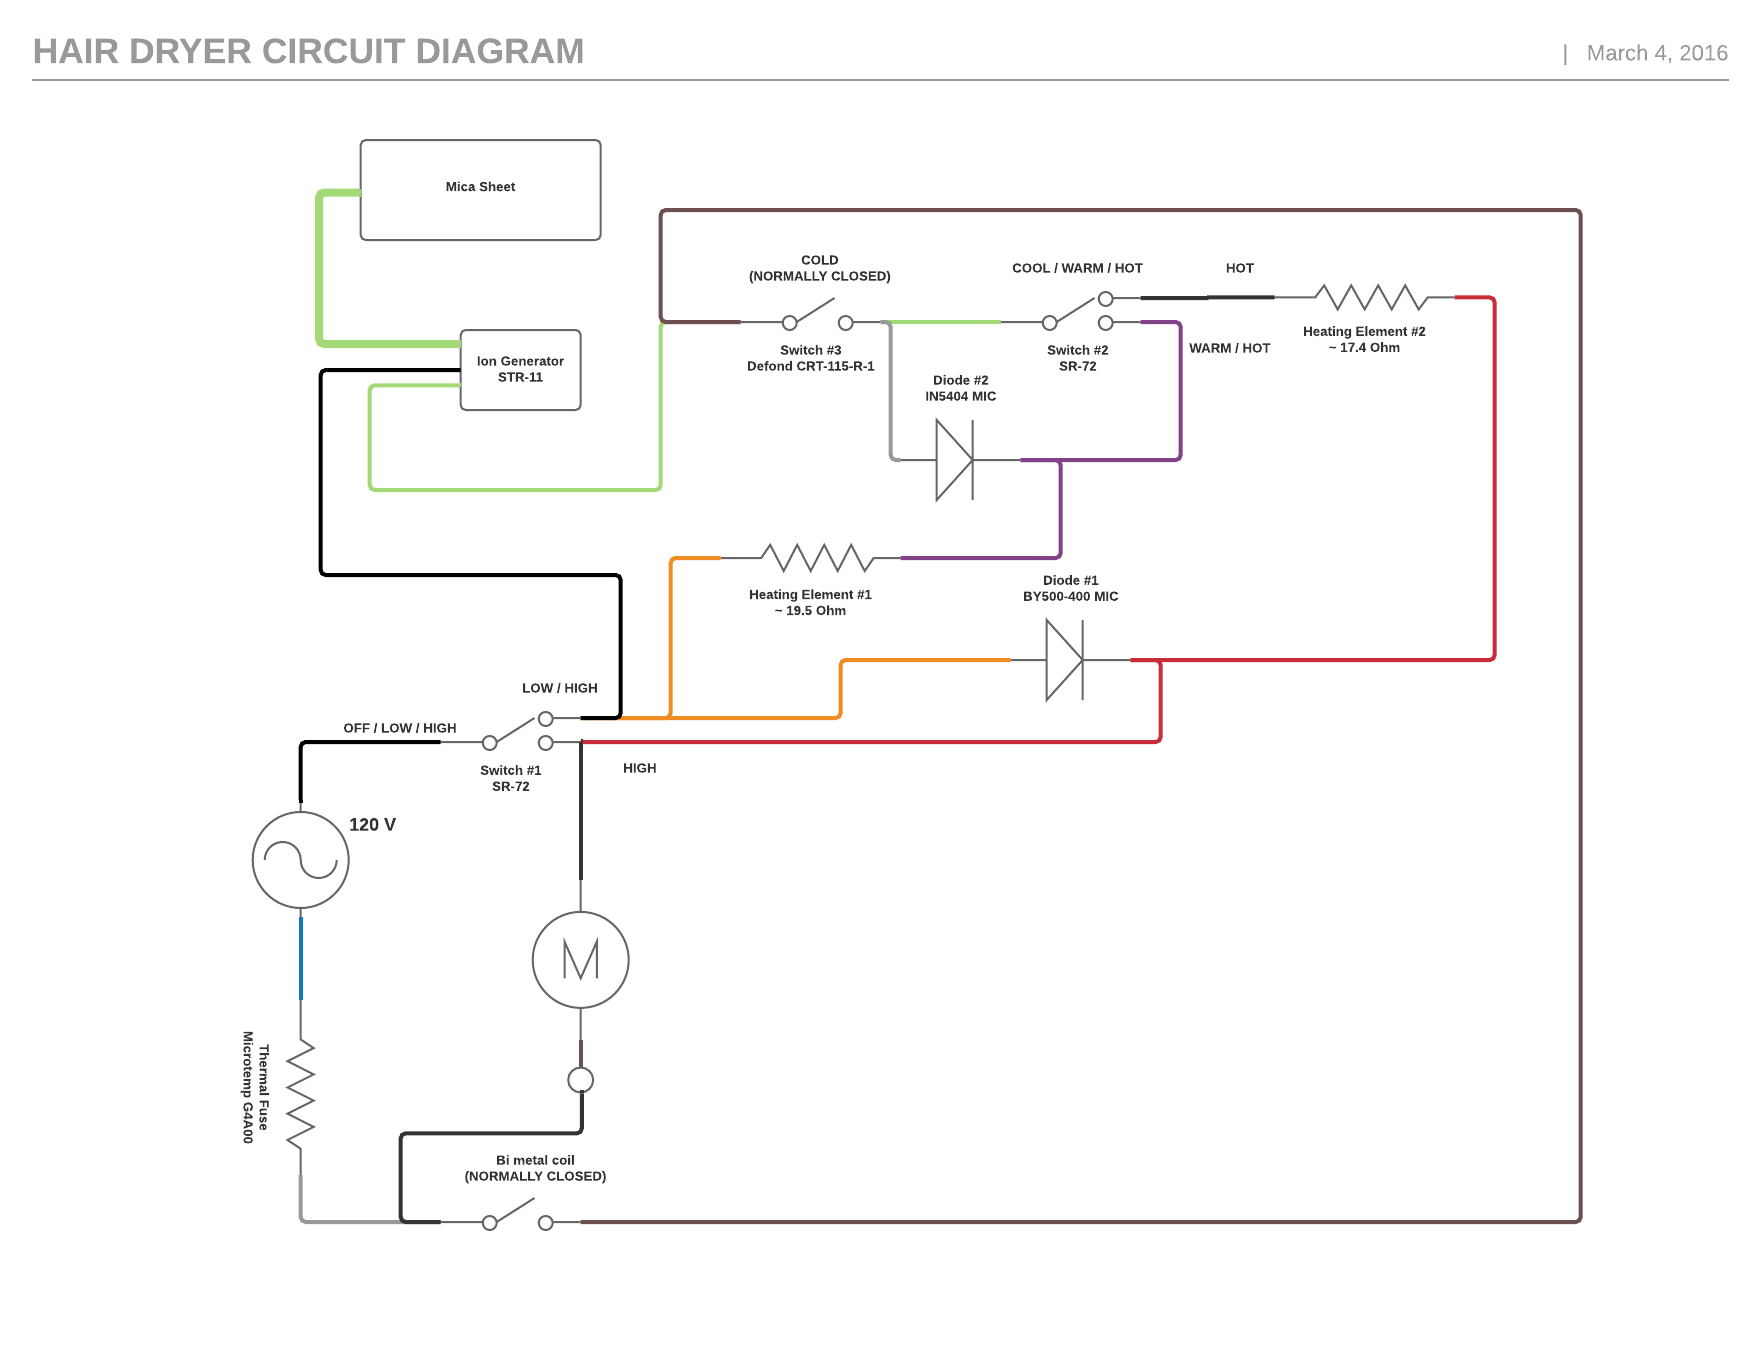 220 volt schematic wiring diagram unique electrical drawing for building diagram wiringdiagram  unique electrical drawing for building